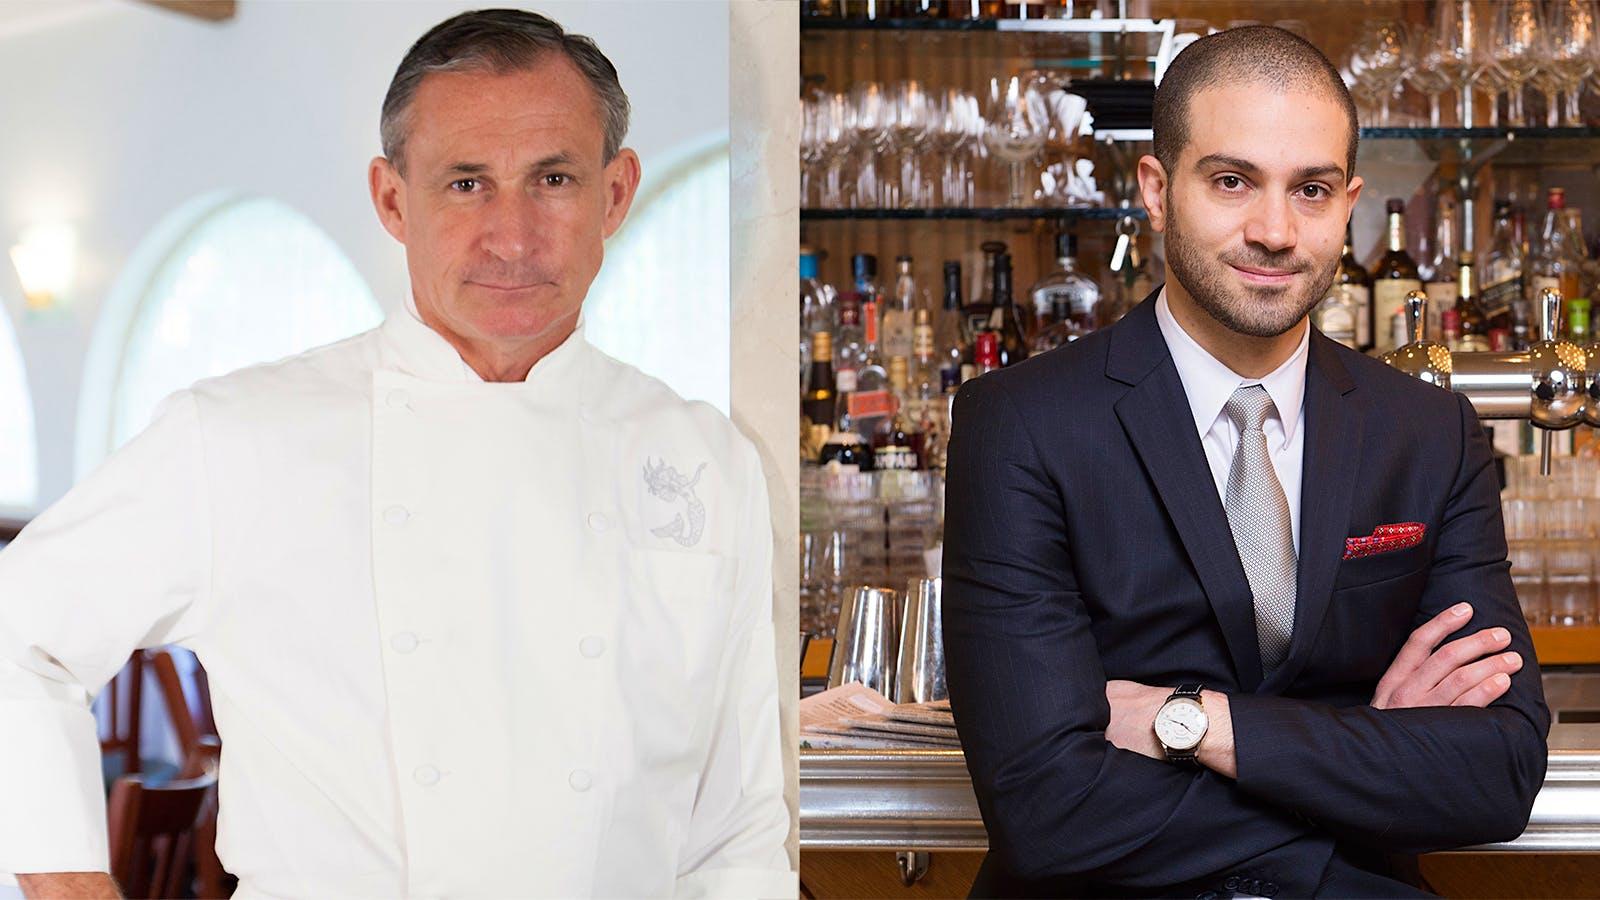 An Award-Winning Mindset: Wine Spectator Chats with Restaurant Industry Stars